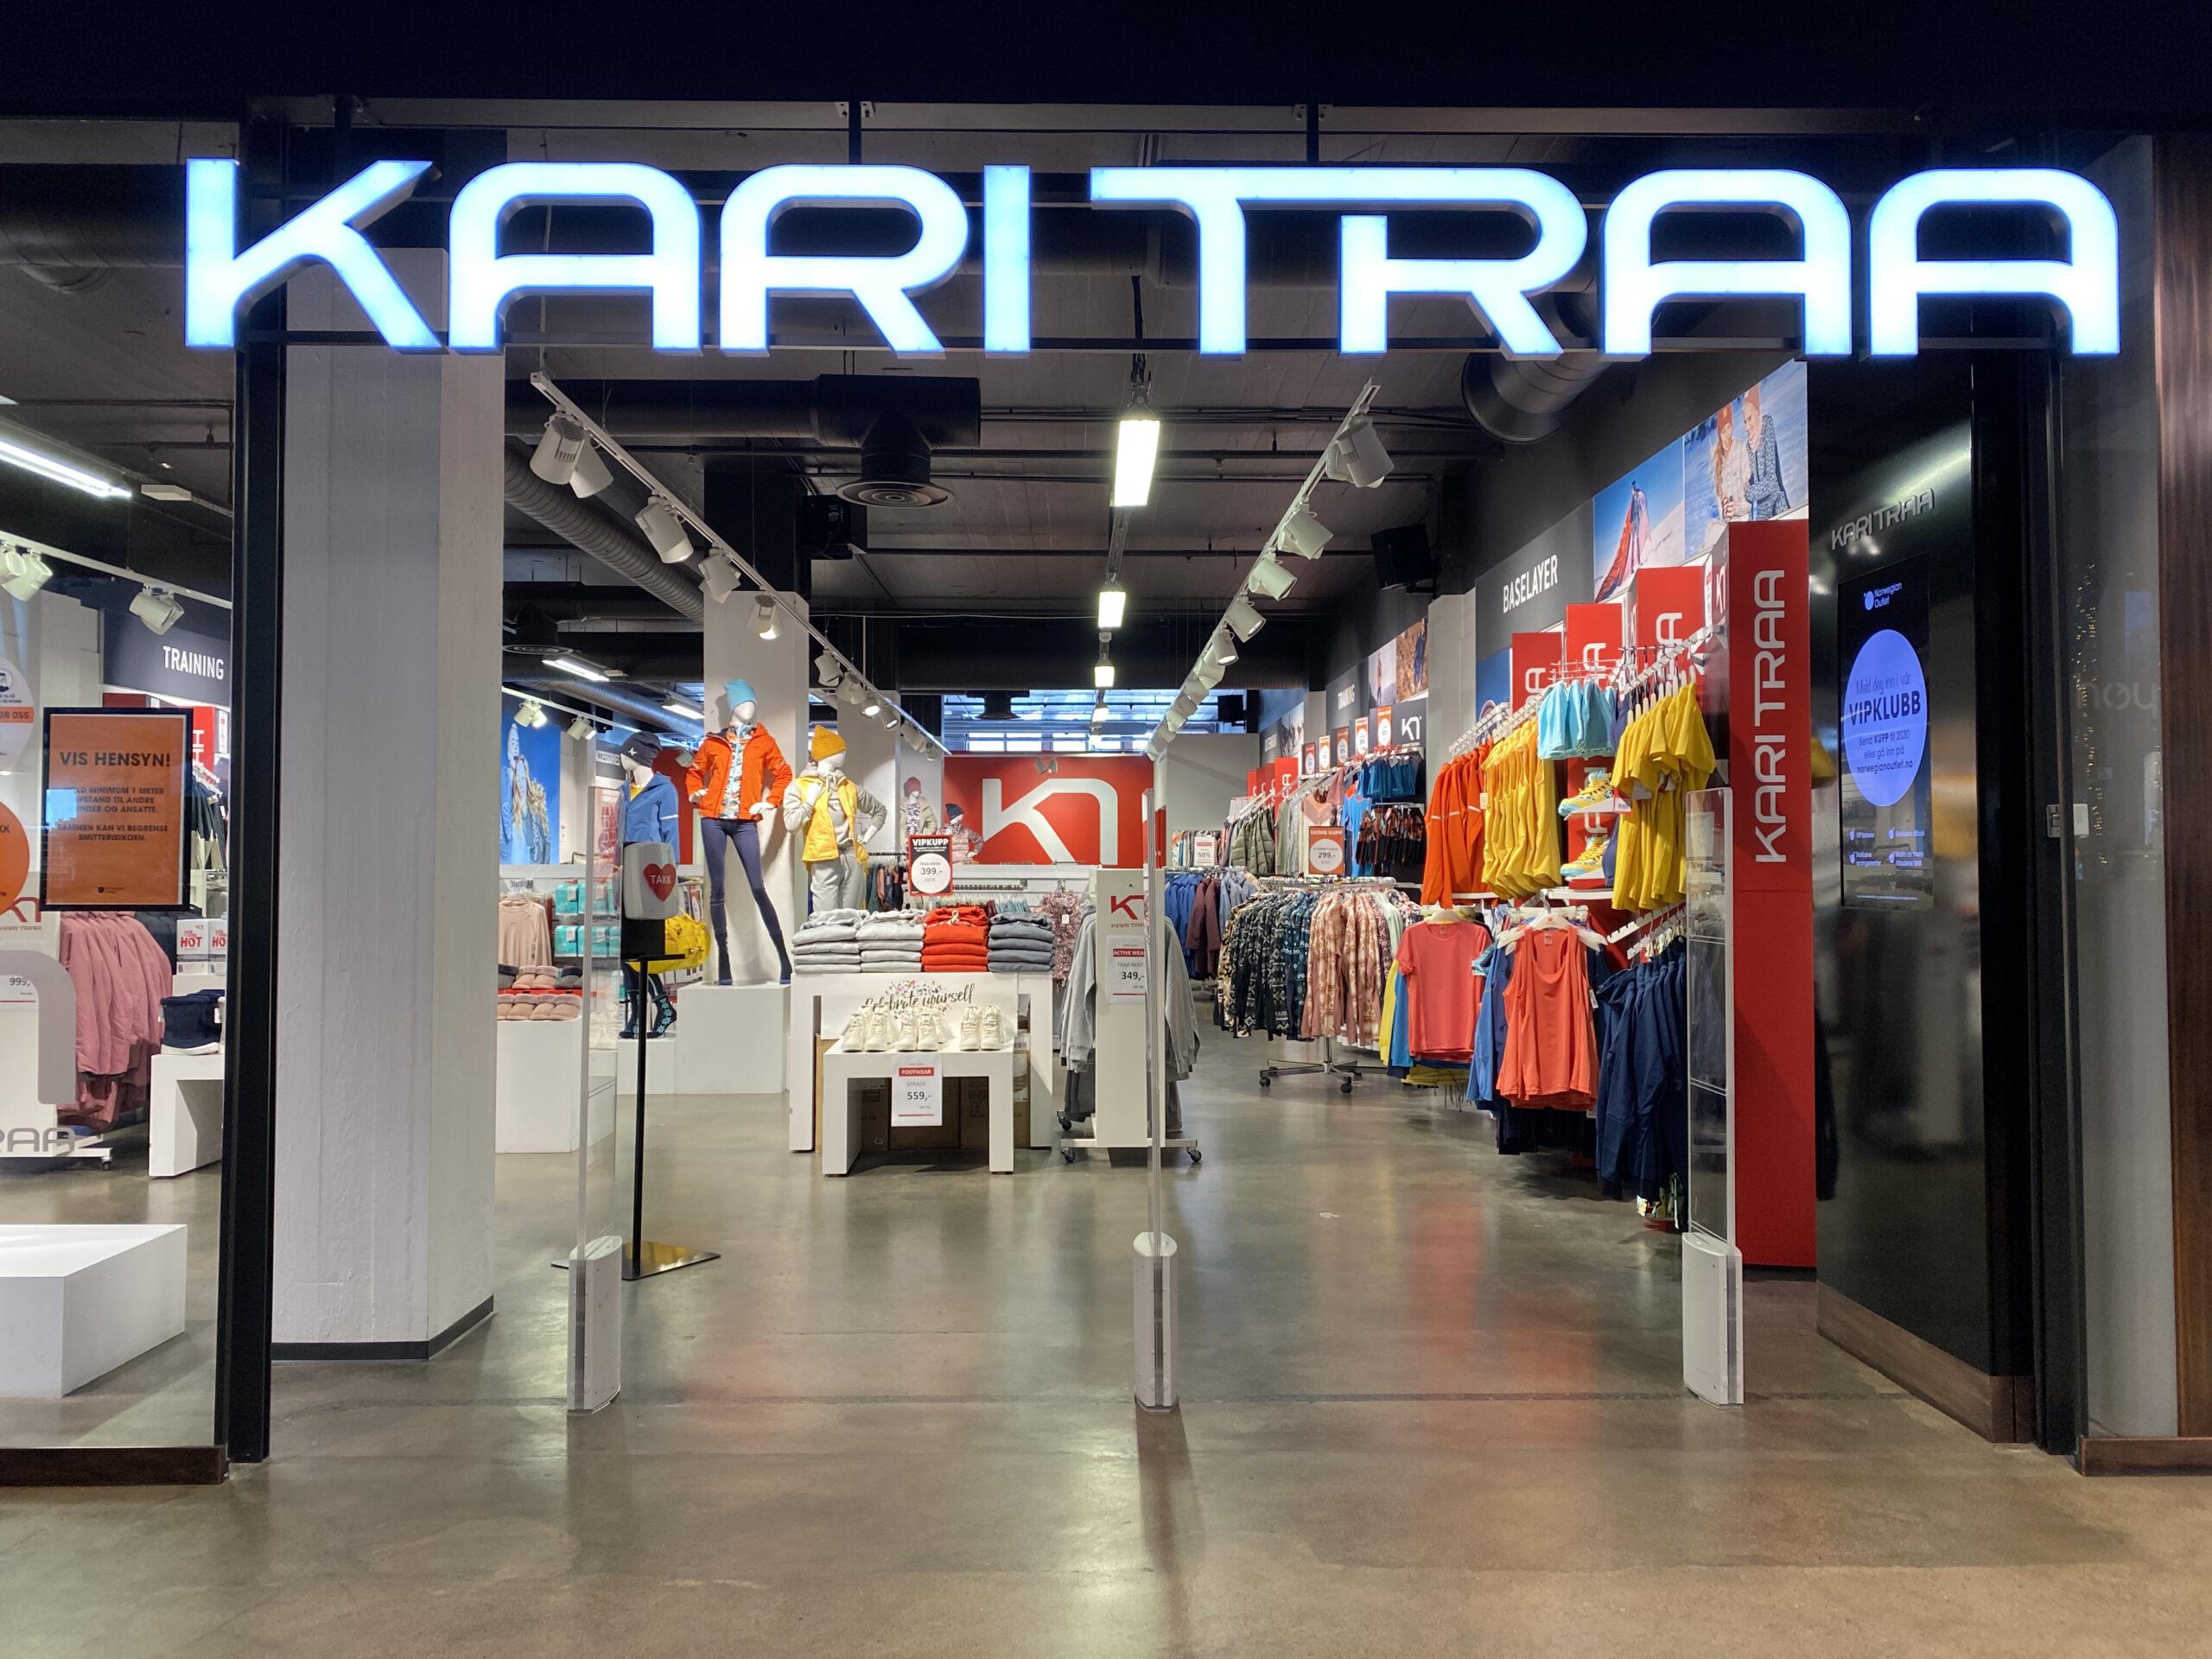 Kari Traa storefront